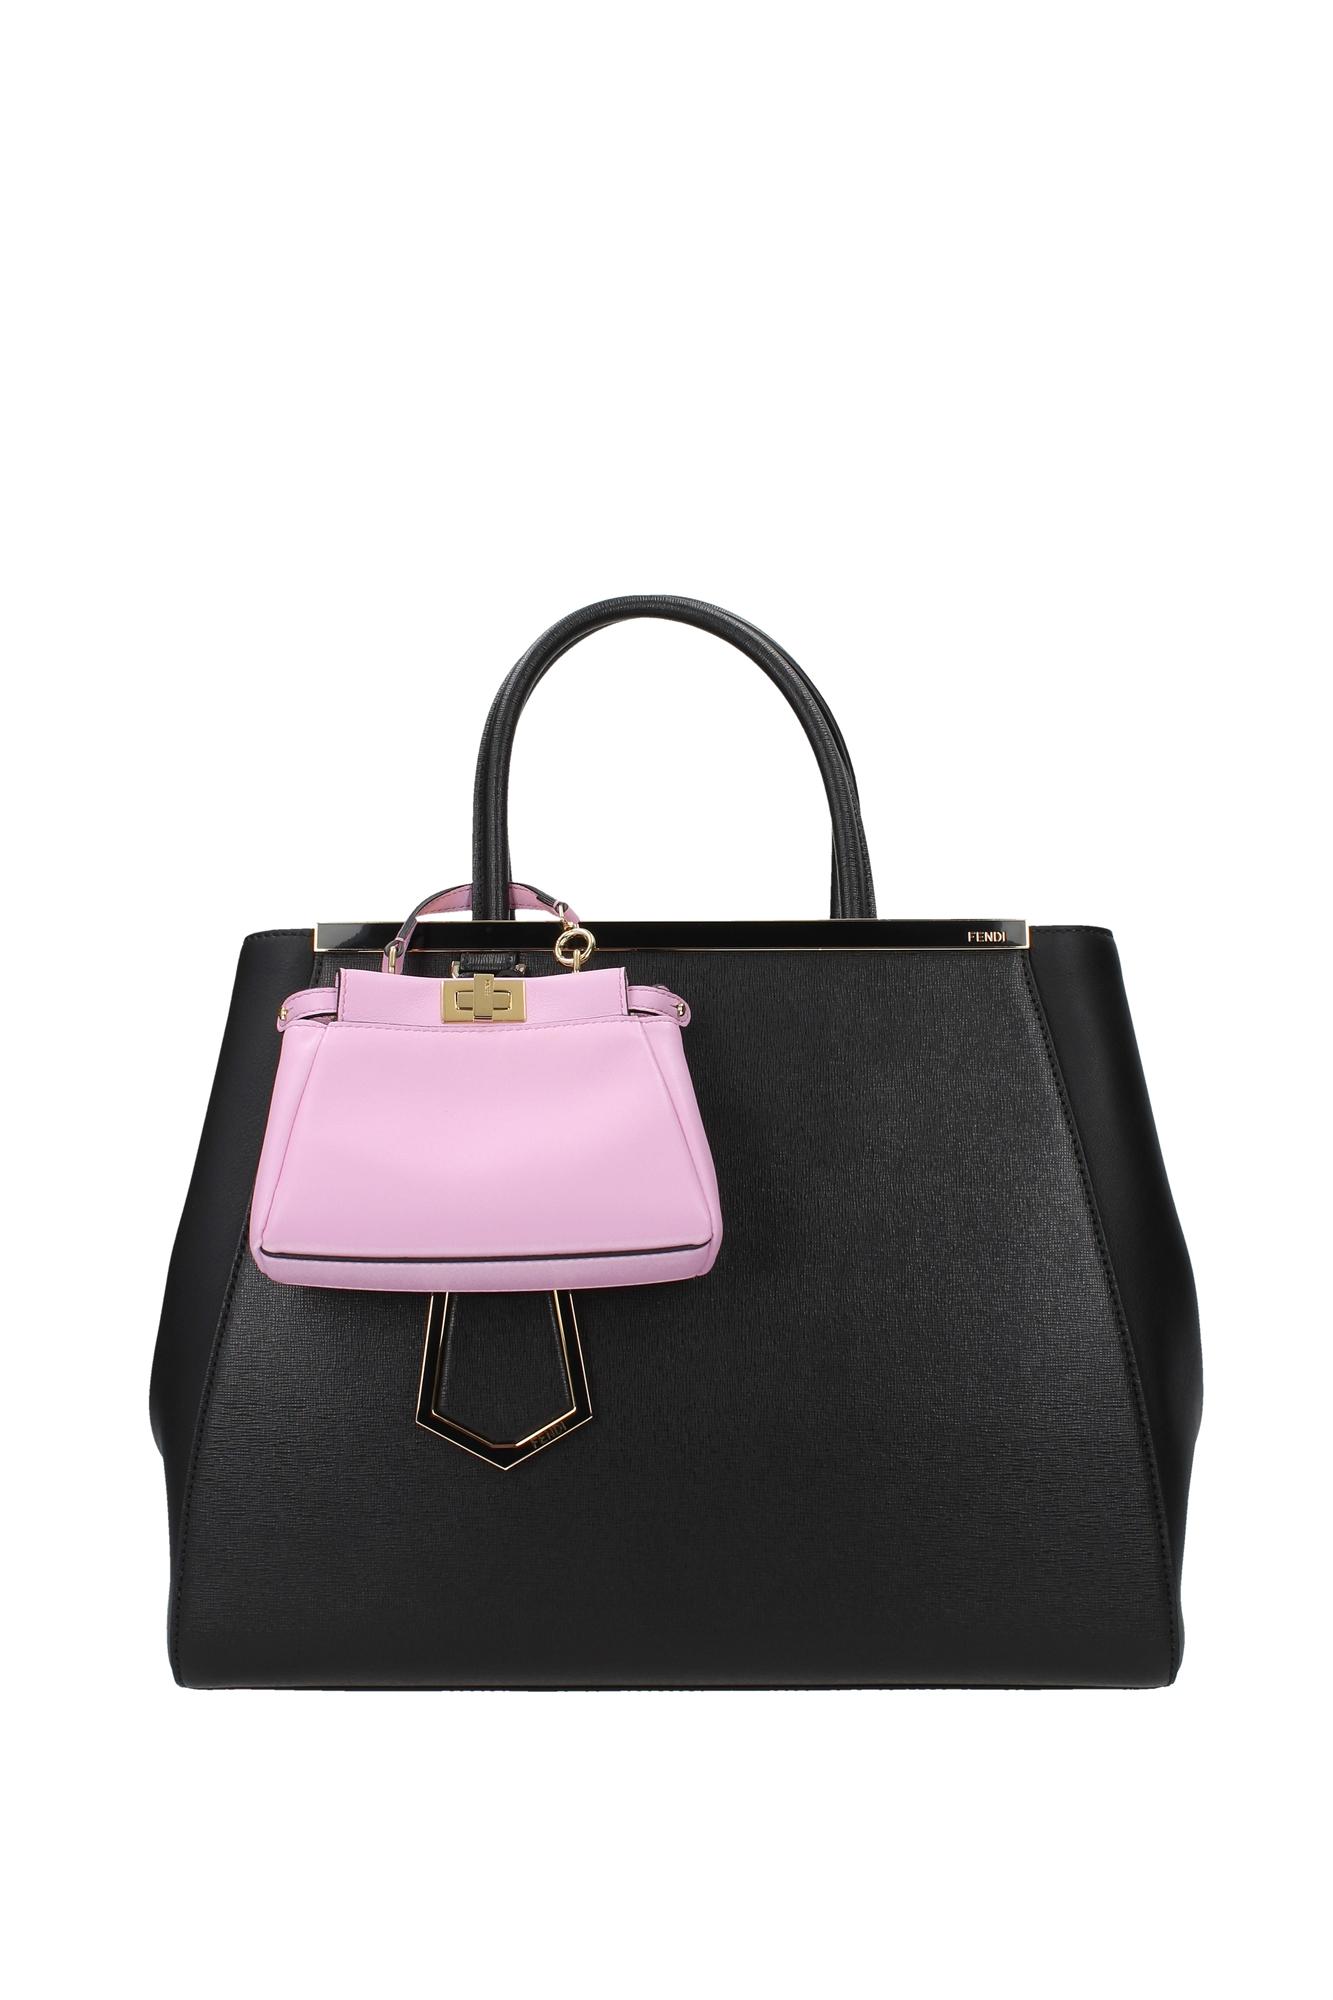 ladies handbags pink - photo #44